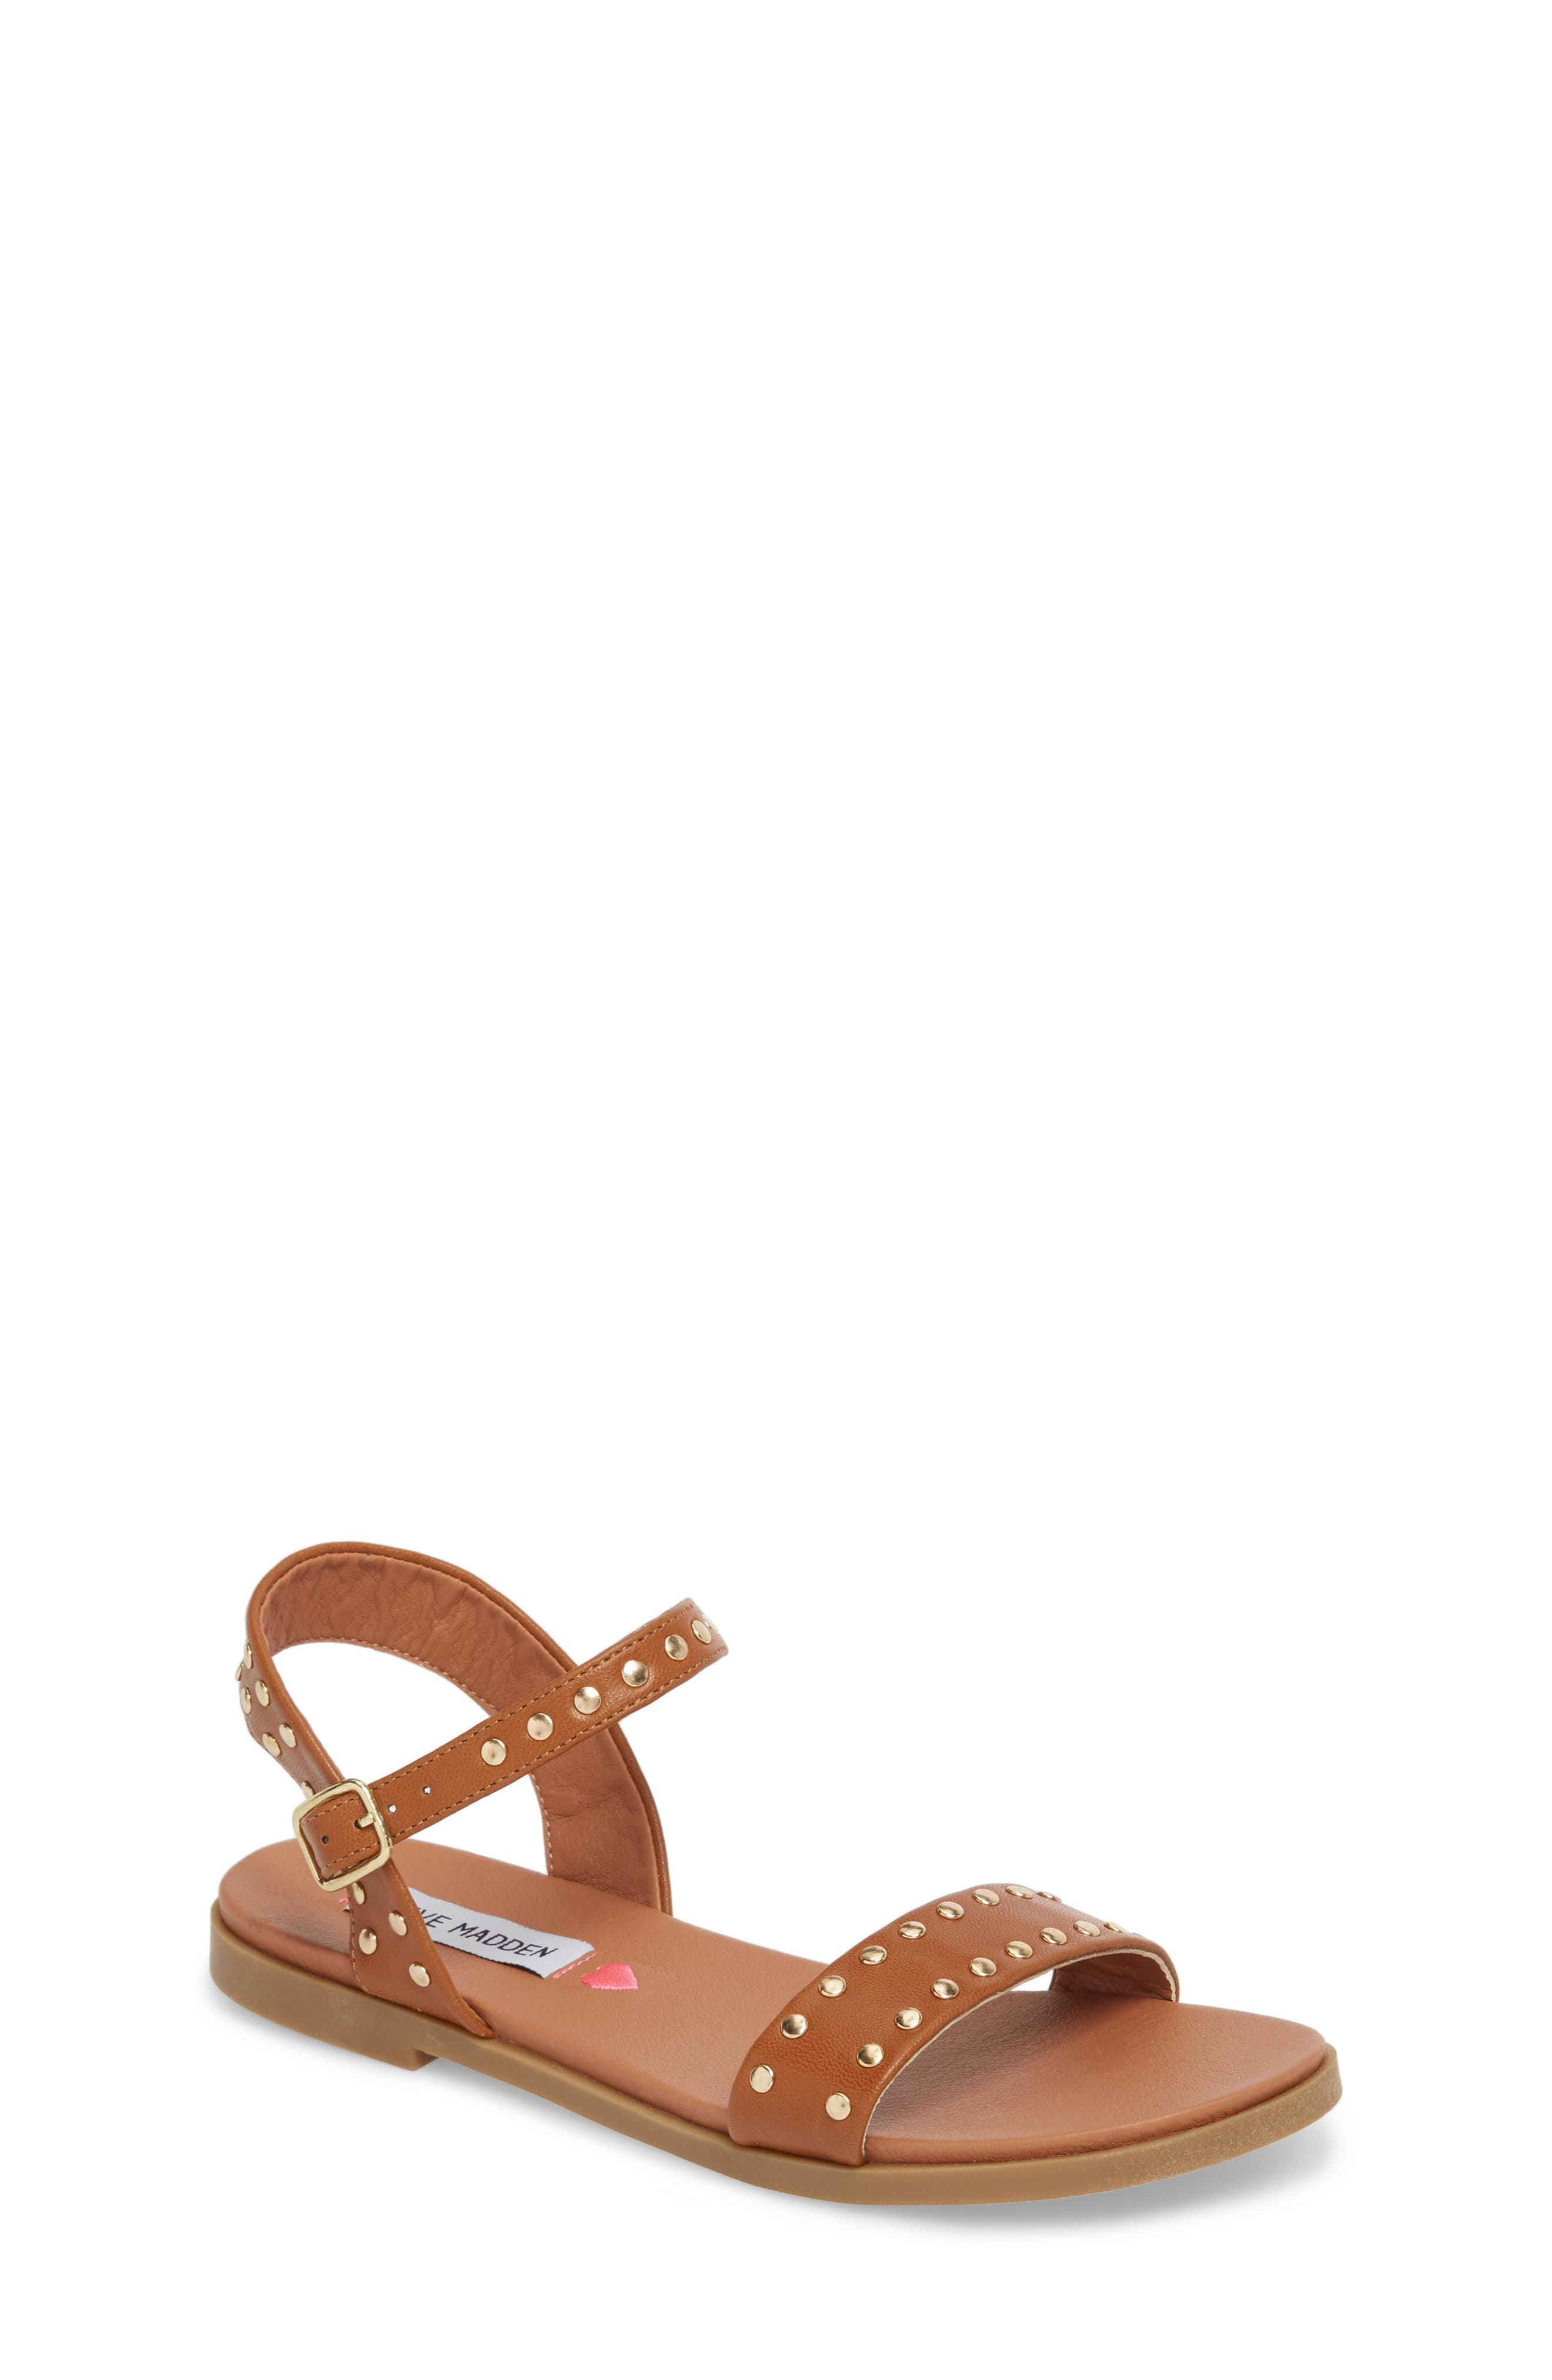 JDONDI Studded Sandal,                         Main,                         color, Cognac